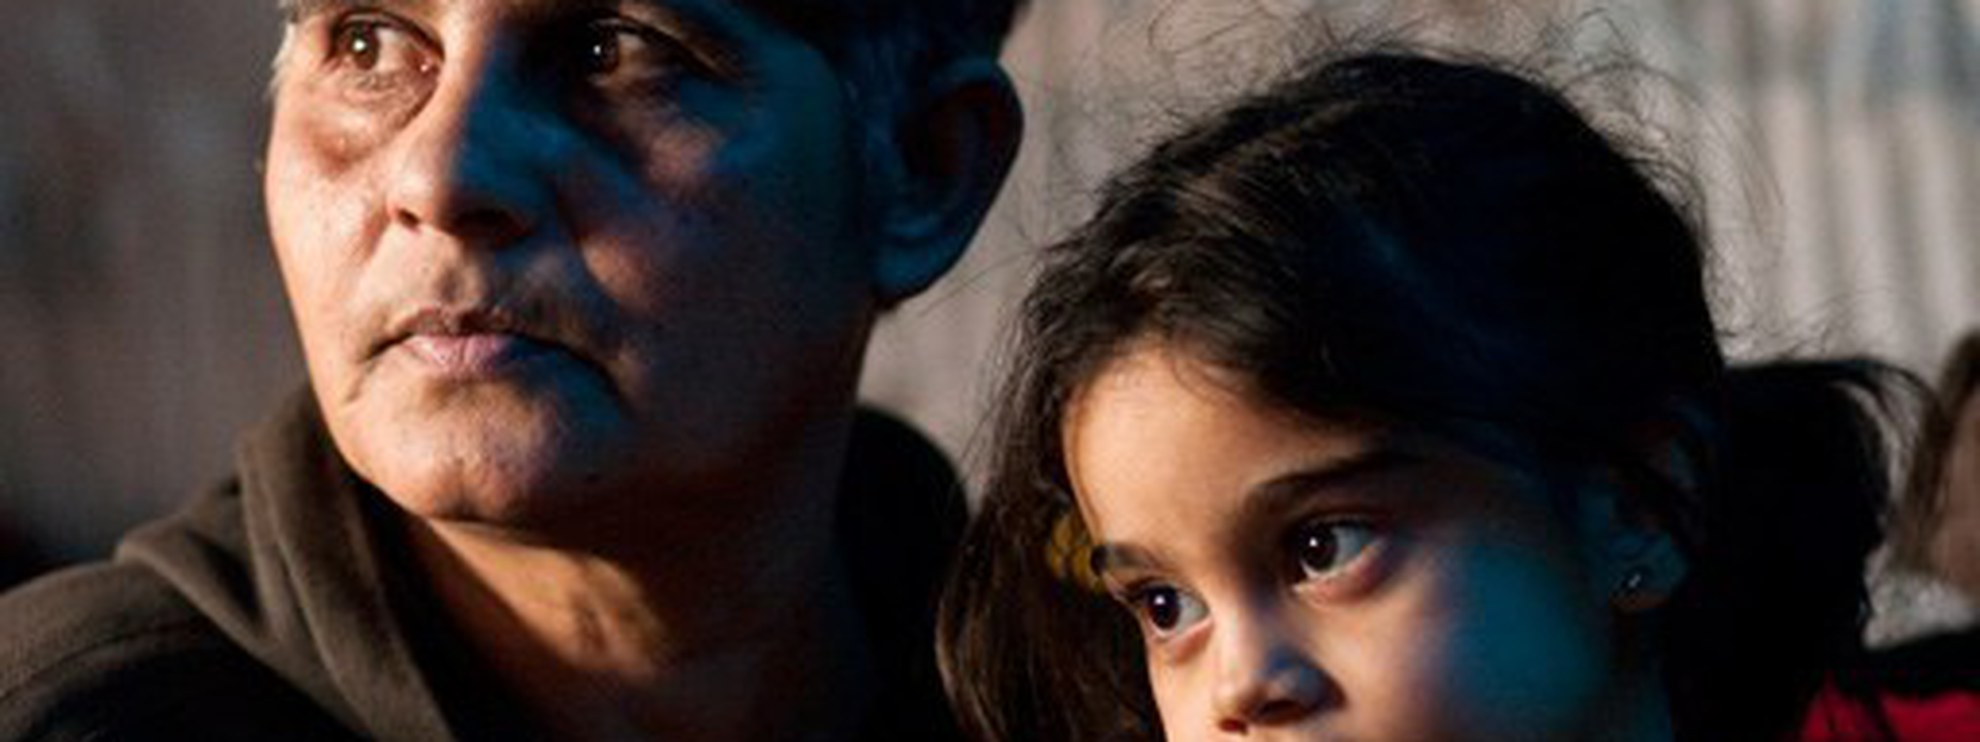 Famille rom à Belgrade. © Amnesty International